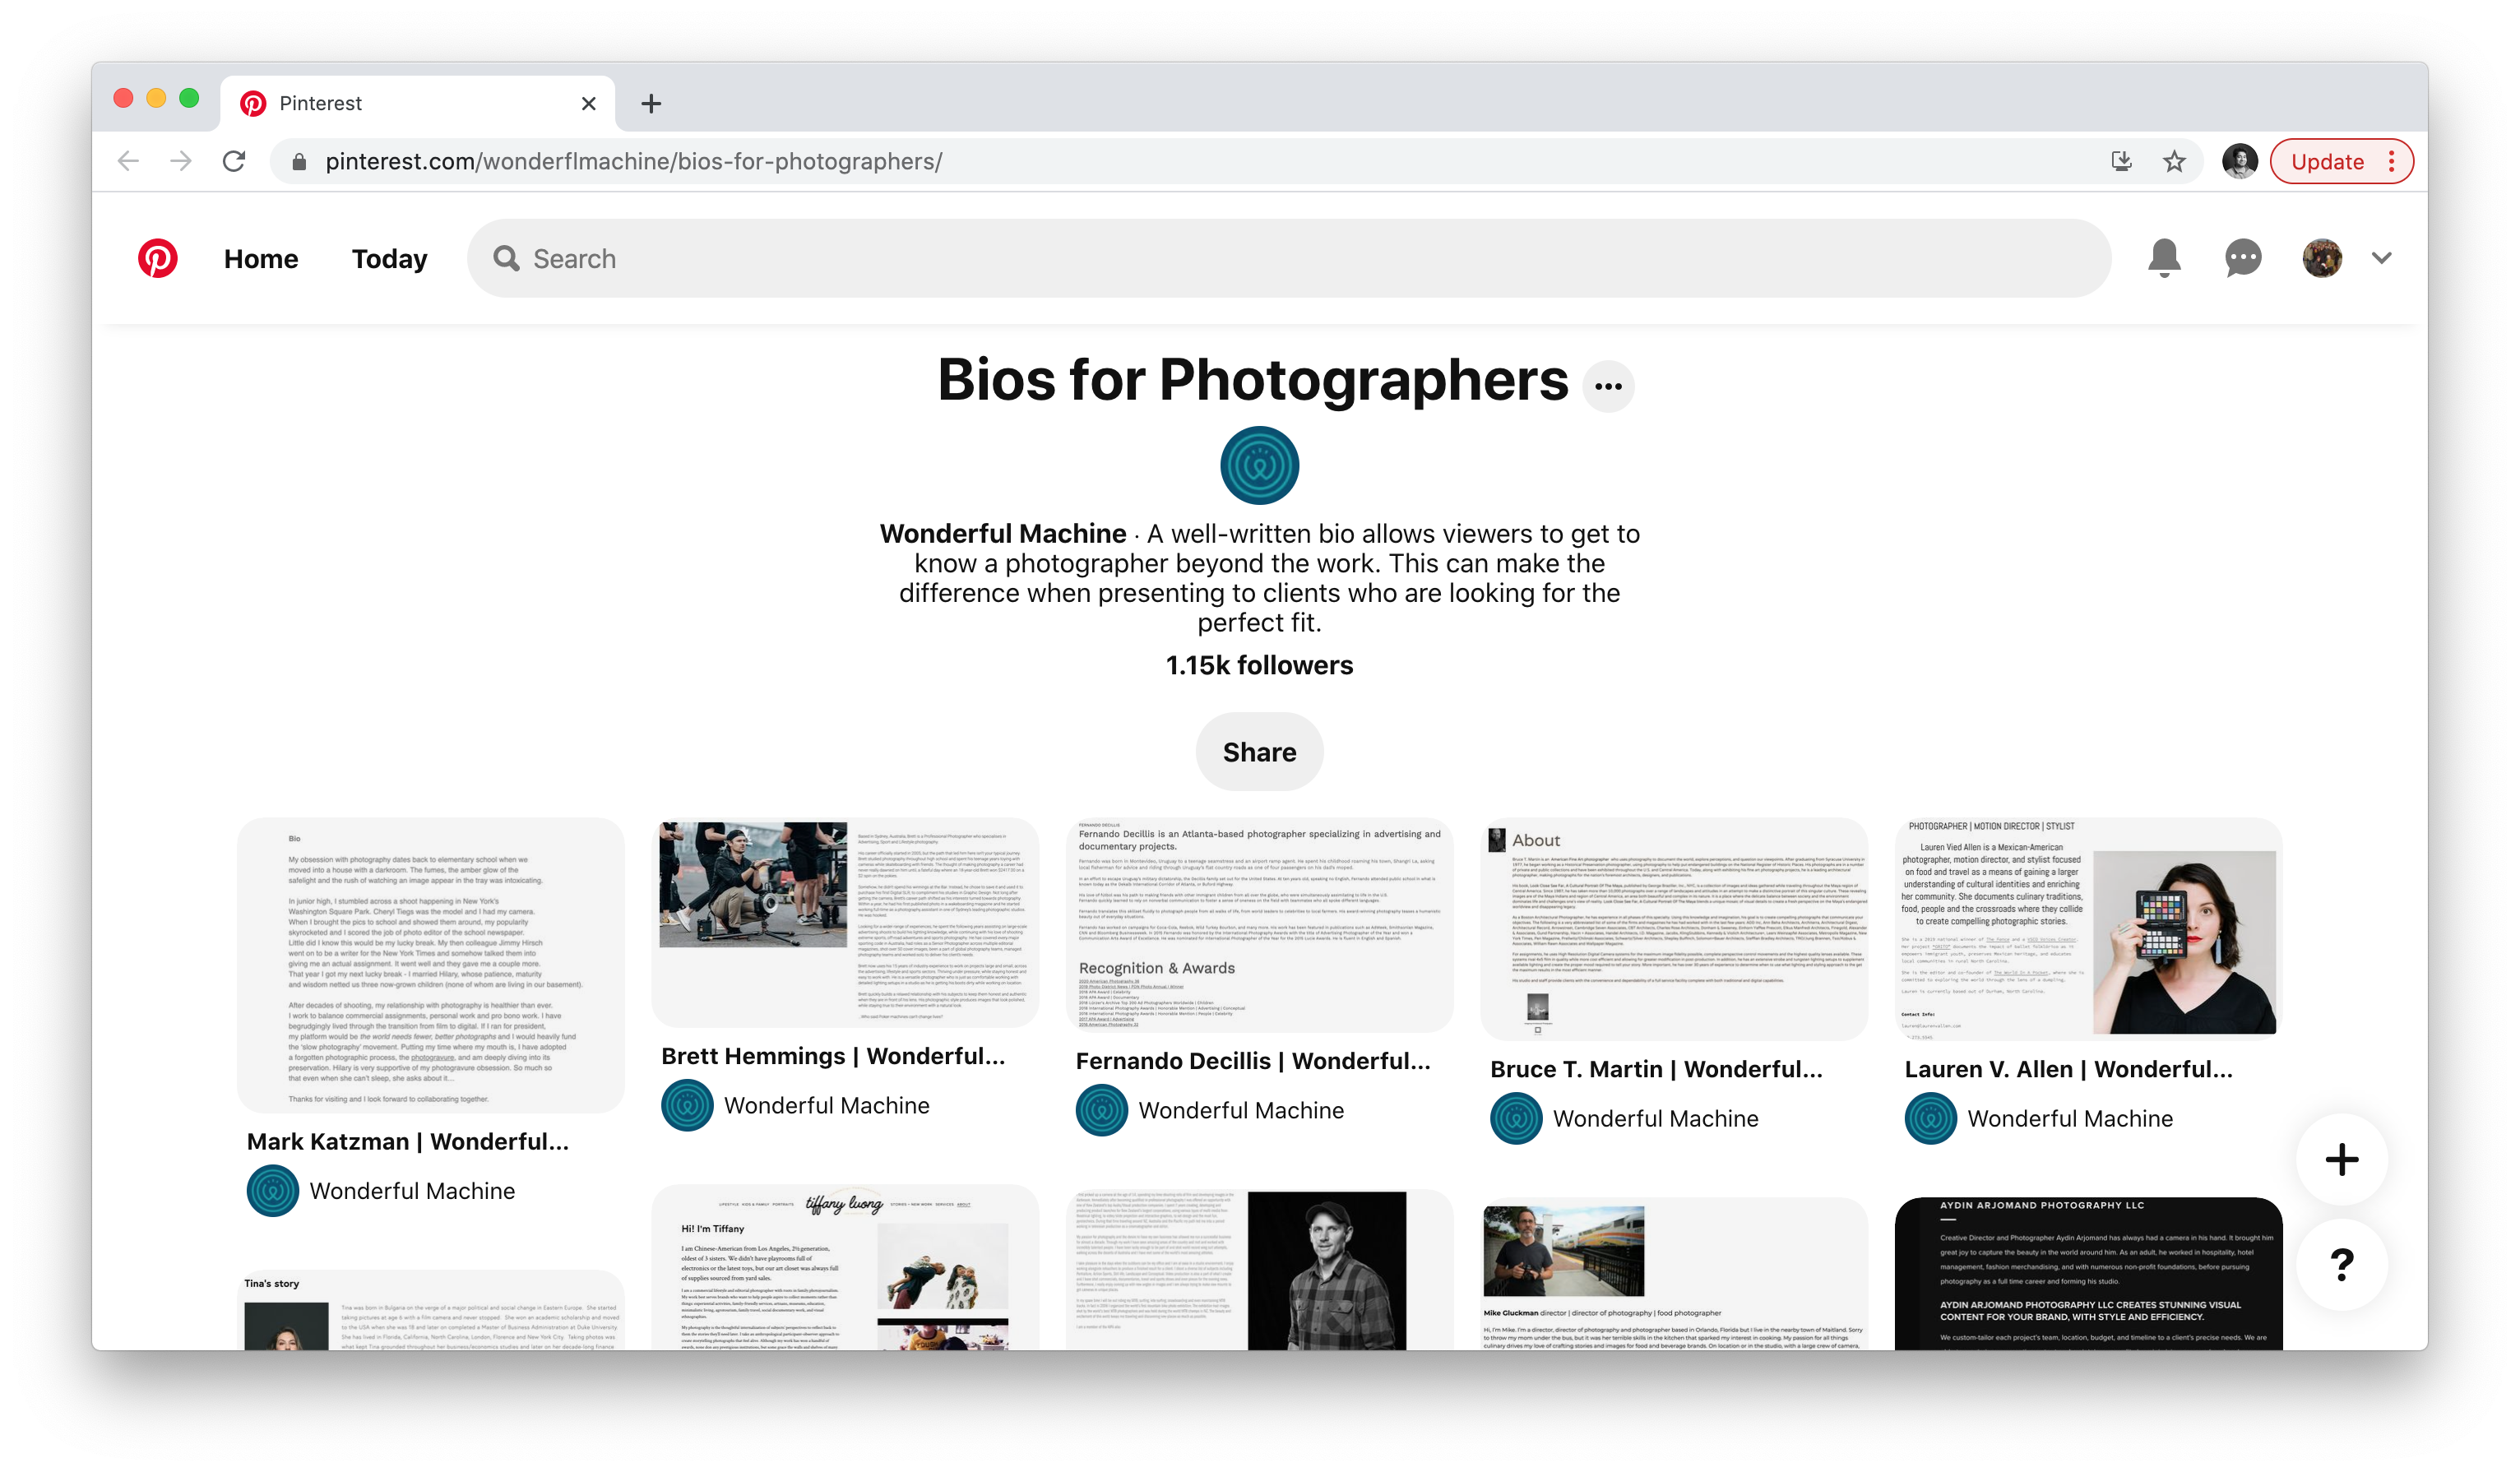 Wonderful Machine's Bios for Photographers Pinterest board